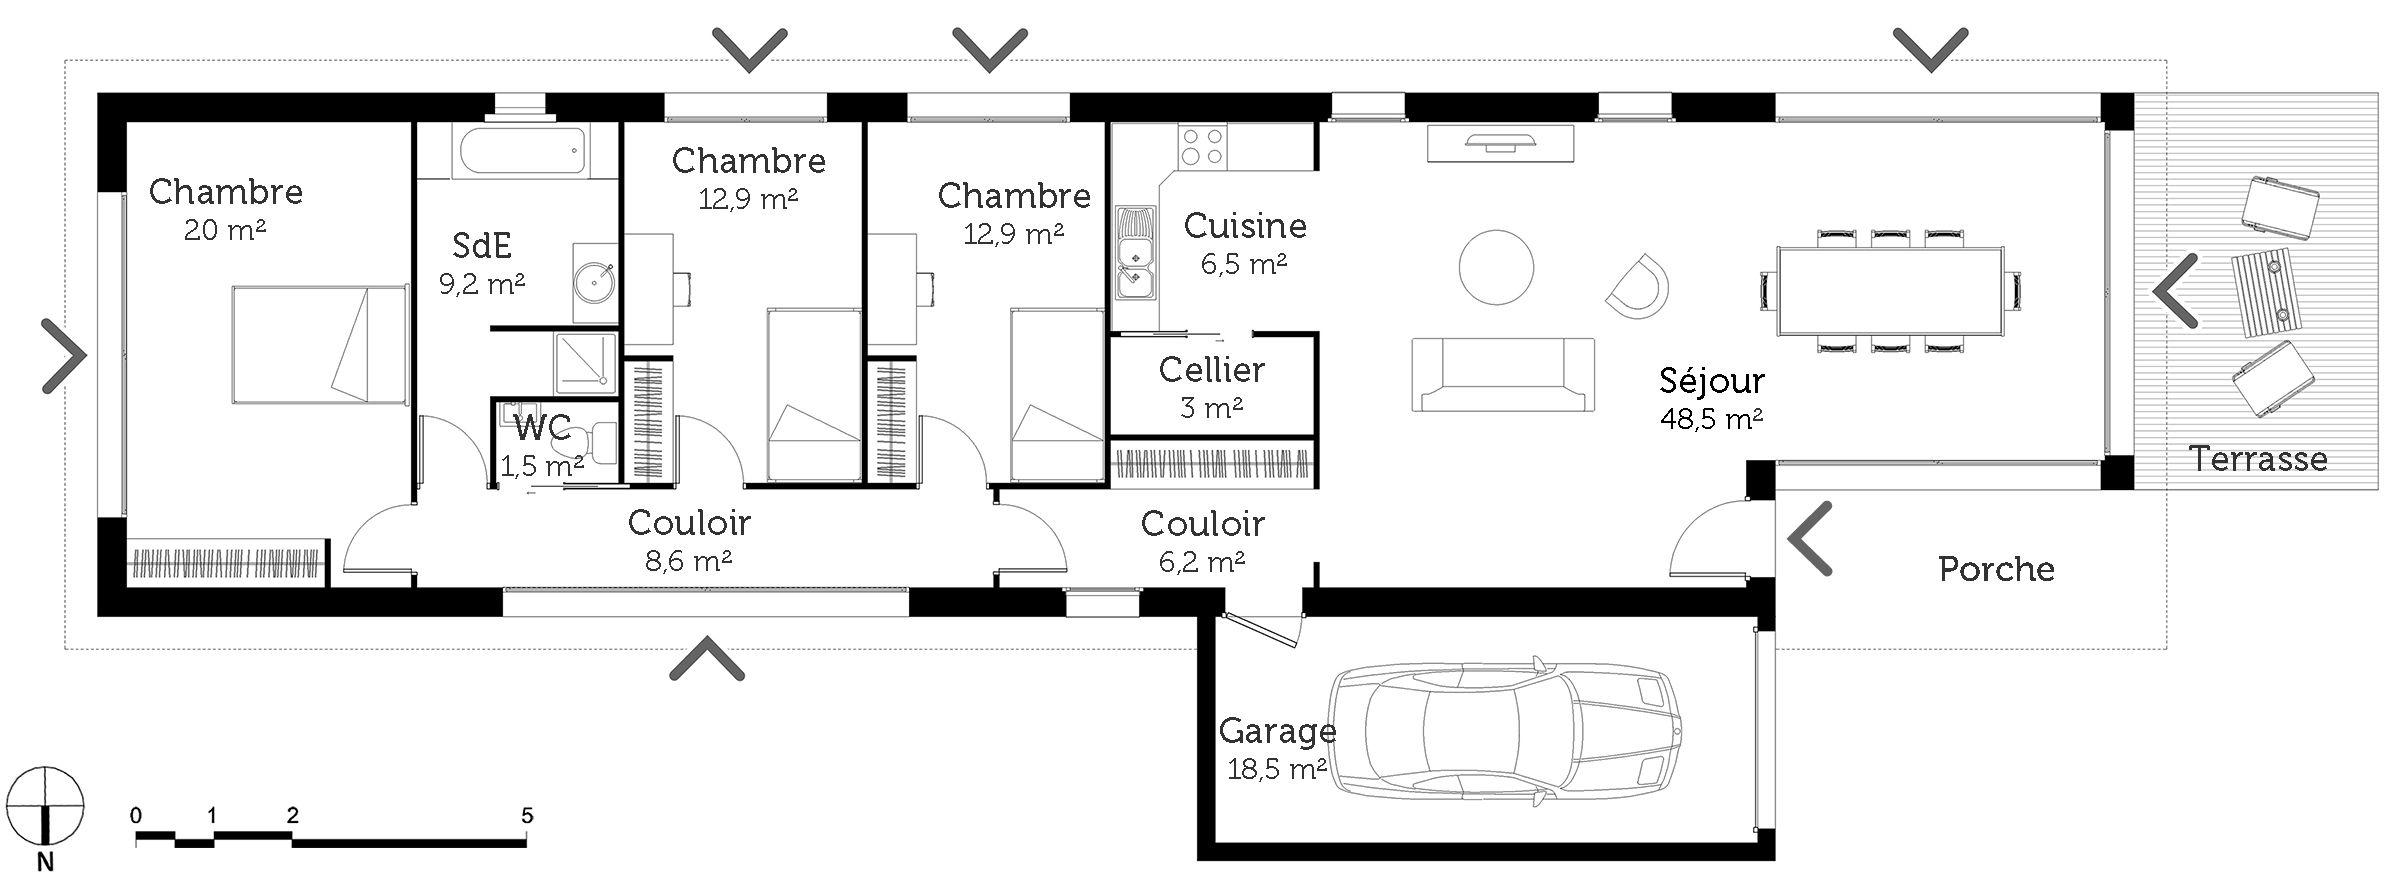 Plan Au Sol Plan Maison Plan Maison 2 Chambres Plan Maison Plain Pied